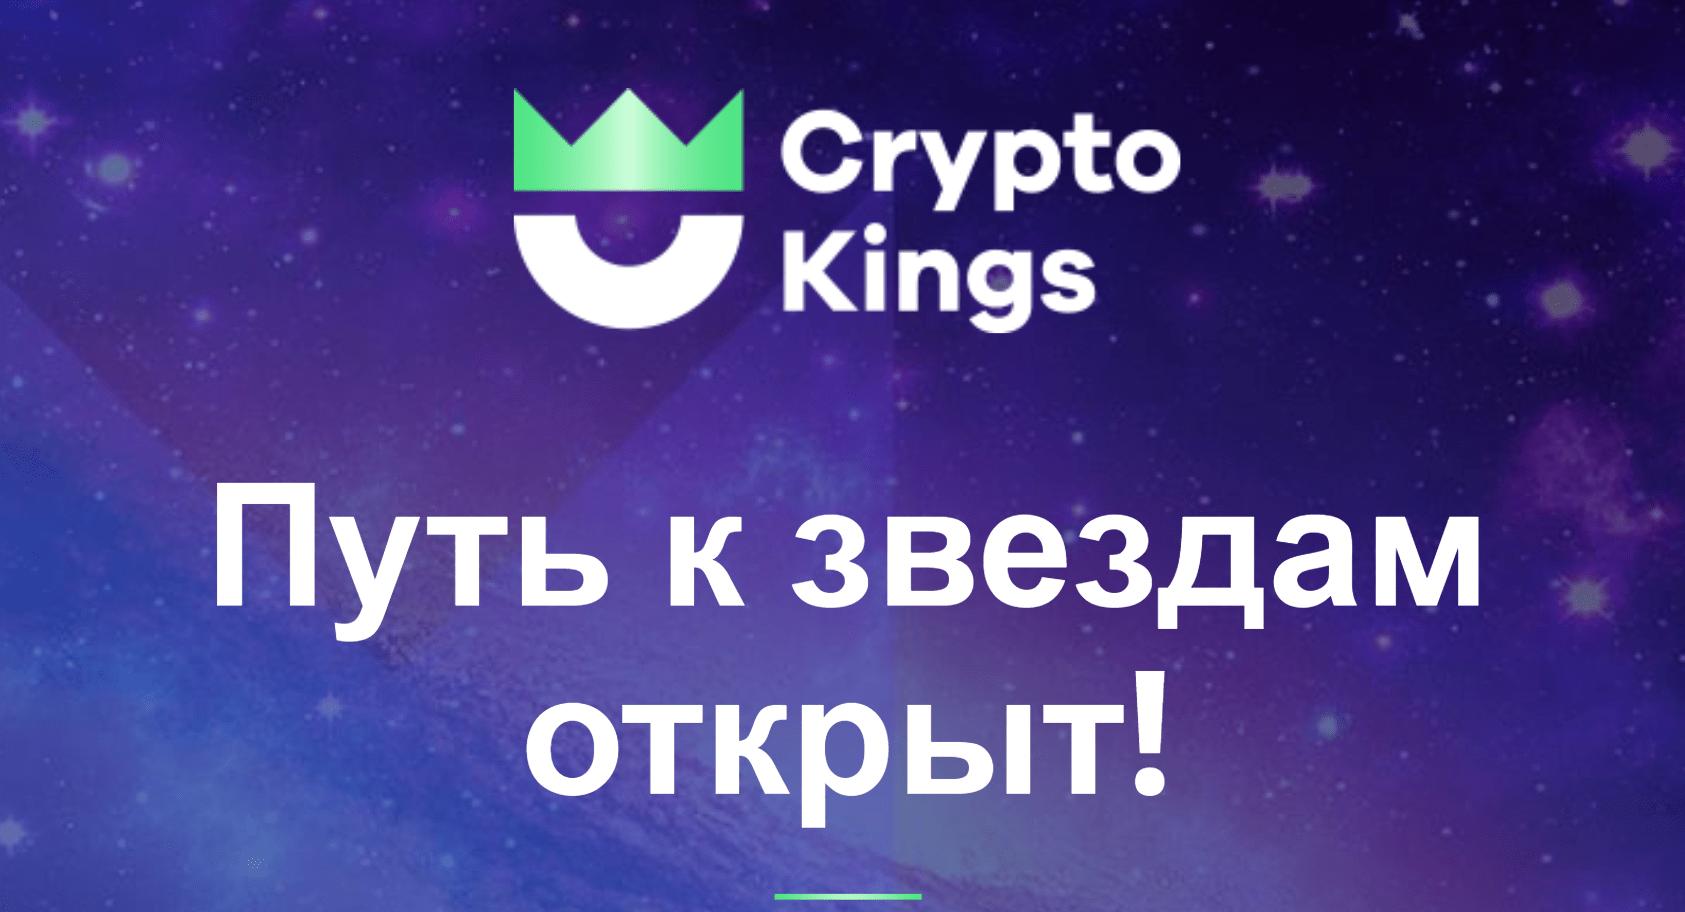 Crypto Kings